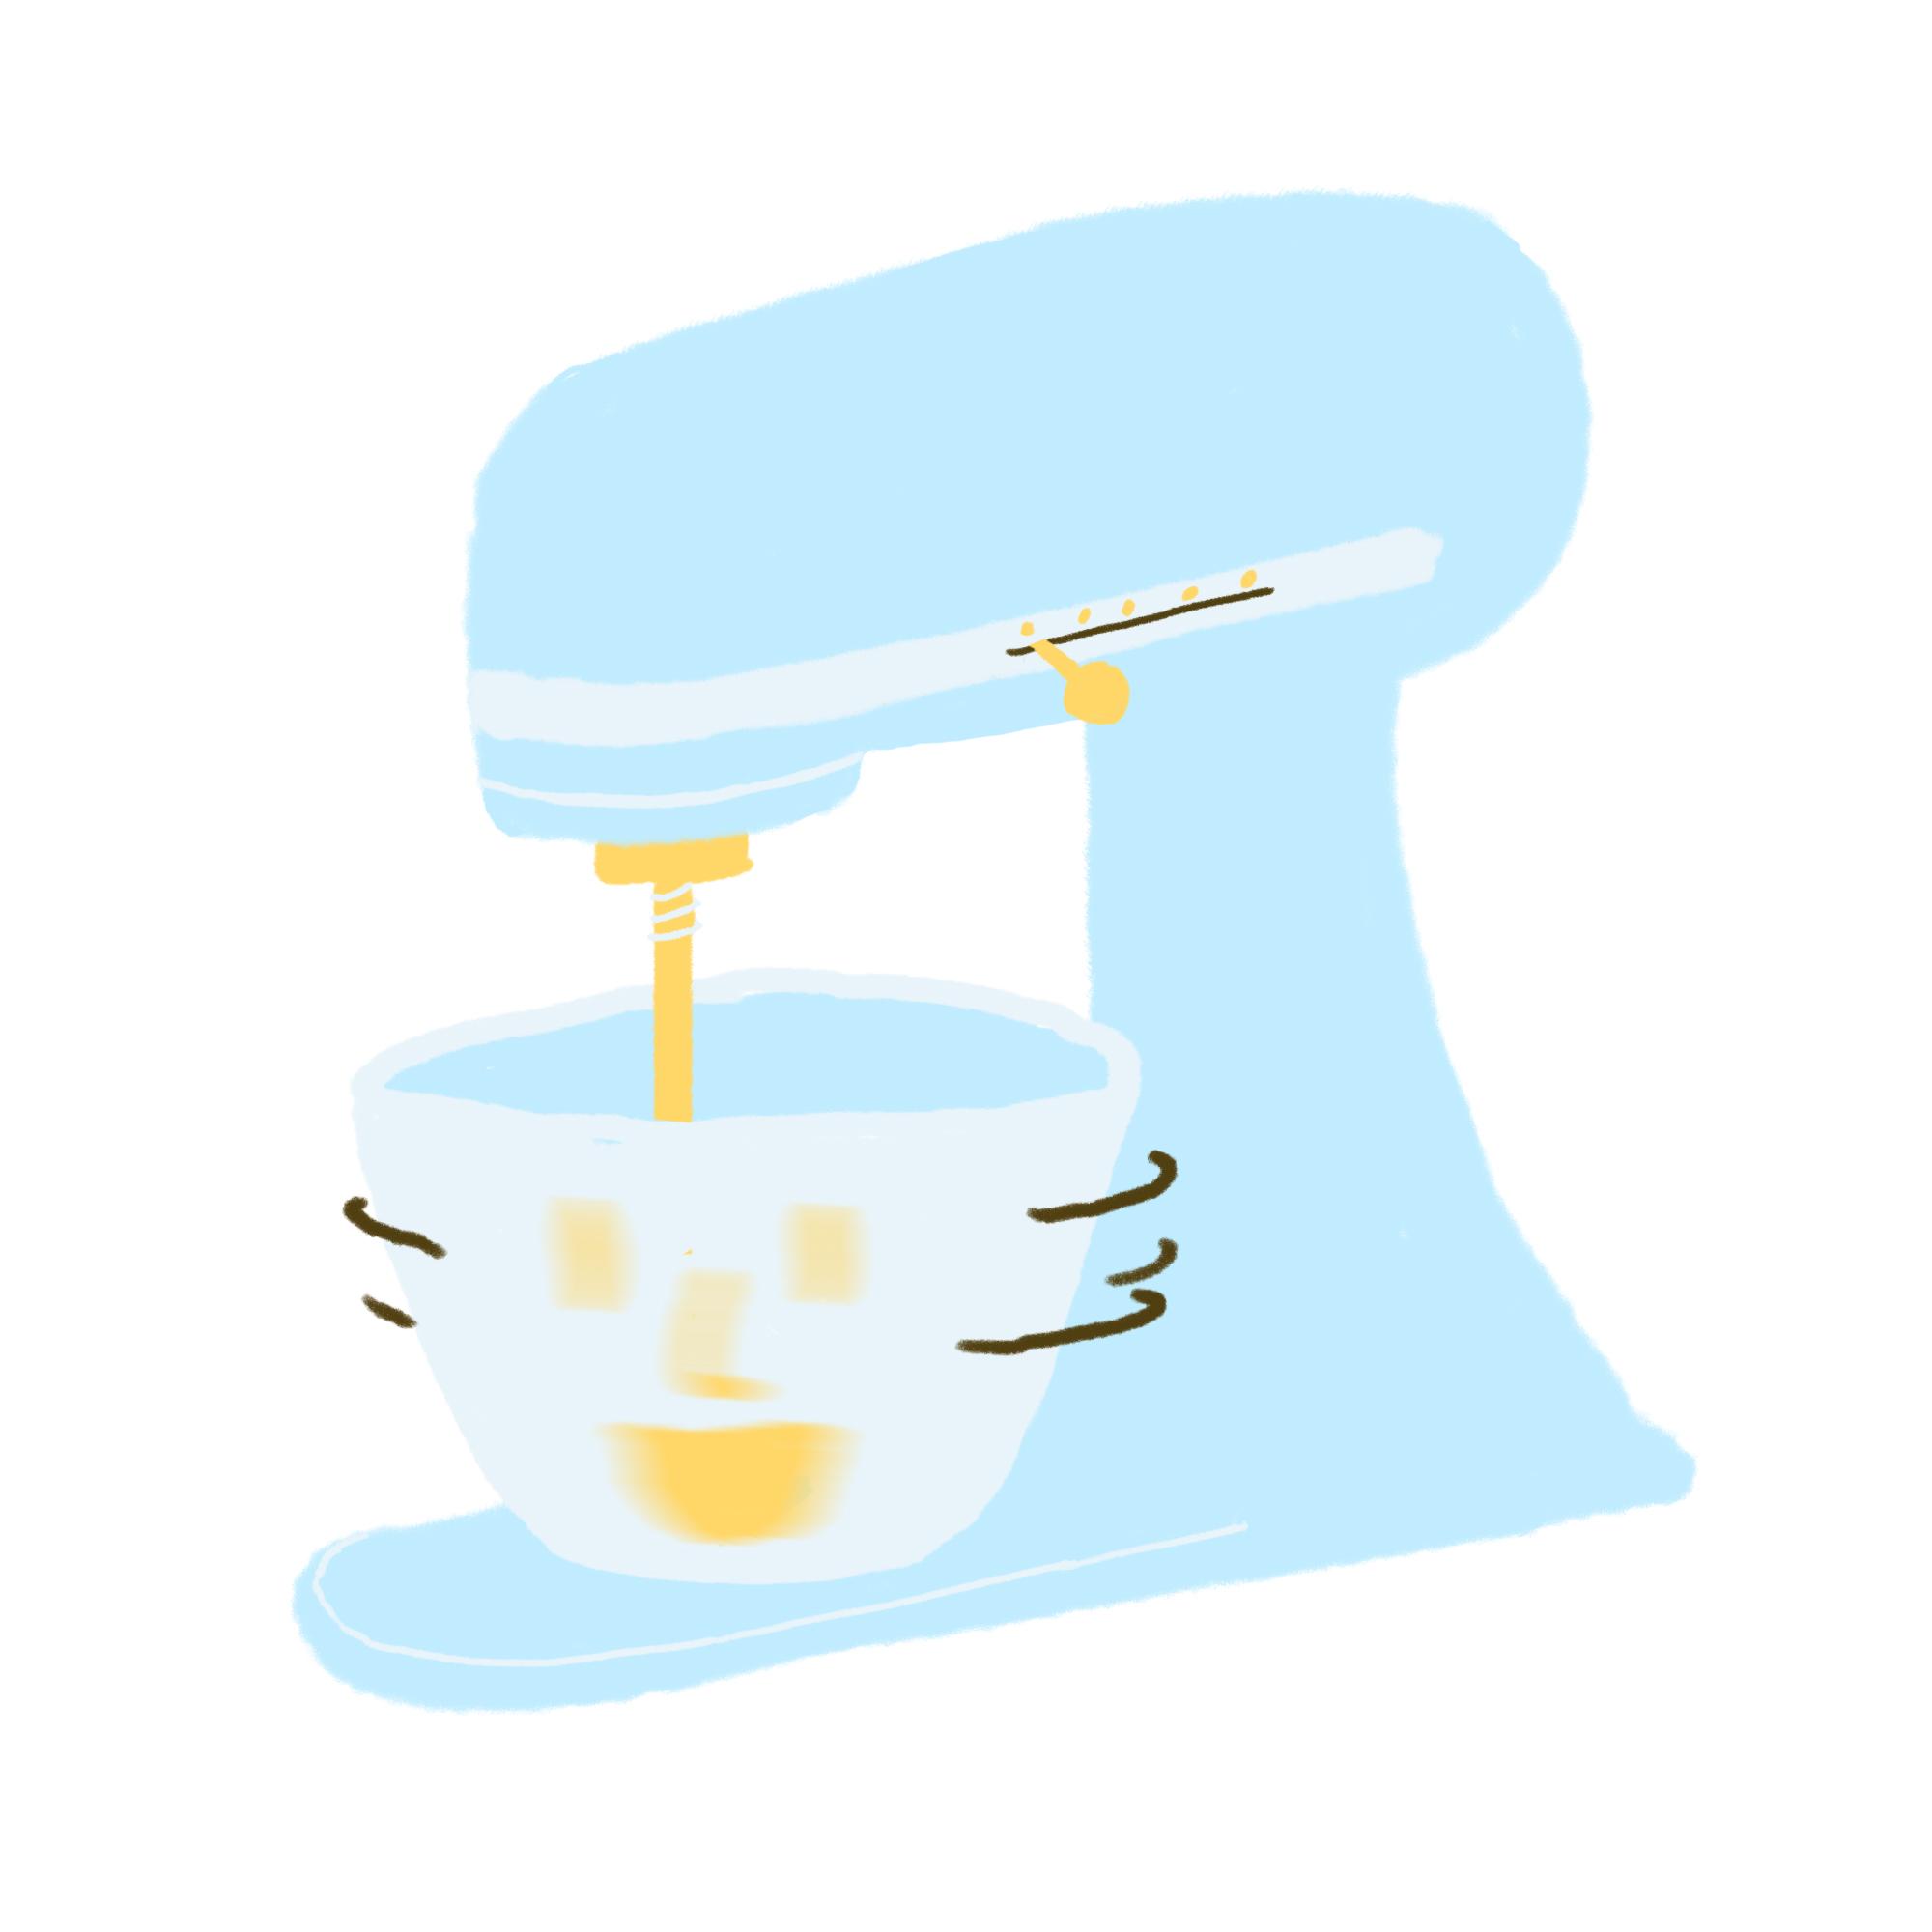 161220_Magic_Kitchen_mixer.jpg